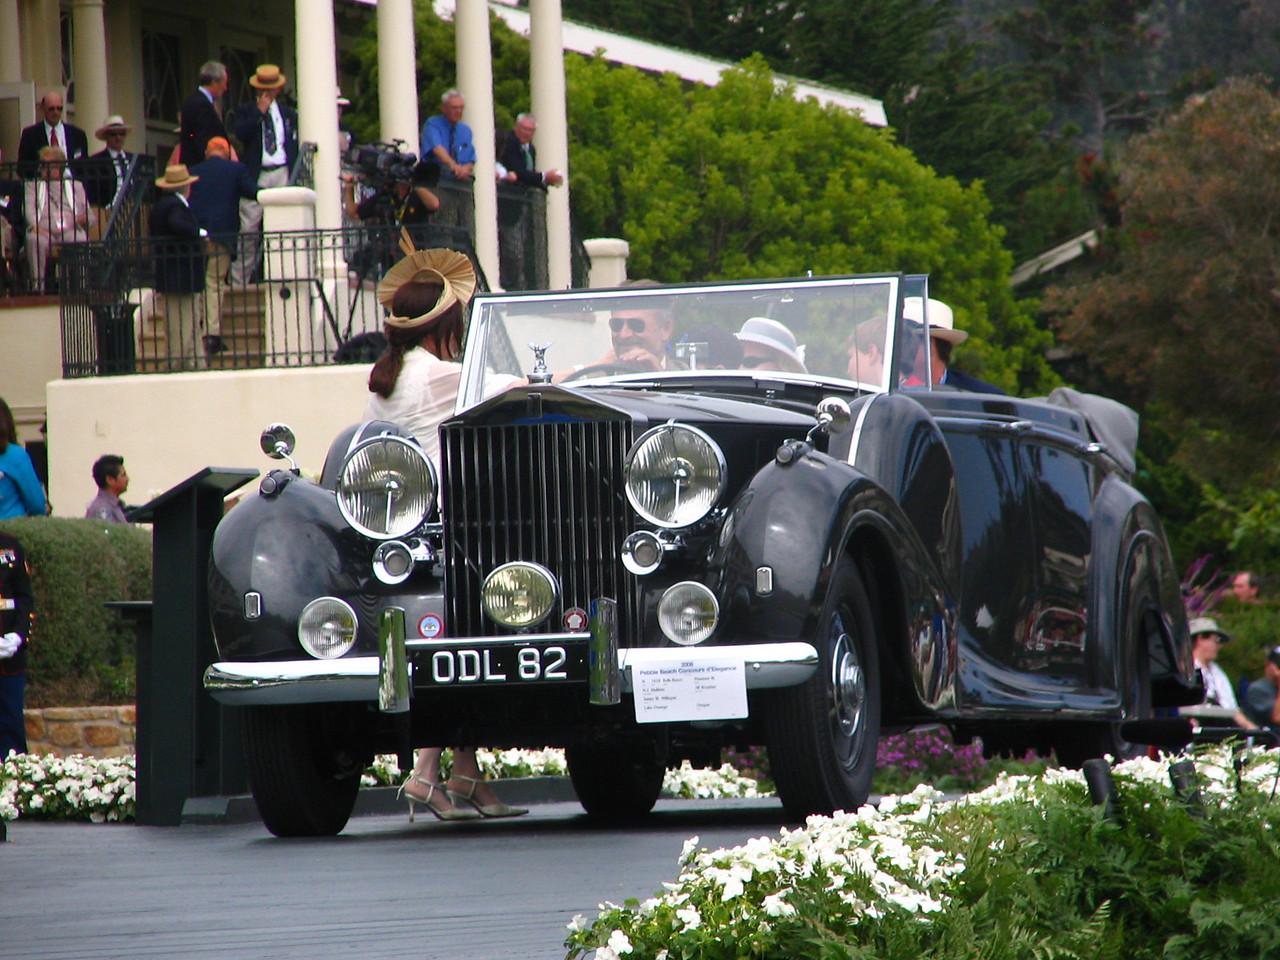 Class H, Rolls-Royce Prewar, Winner -- 1938 Rolls-Royce Phantom III H.J. Mulliner All Weather